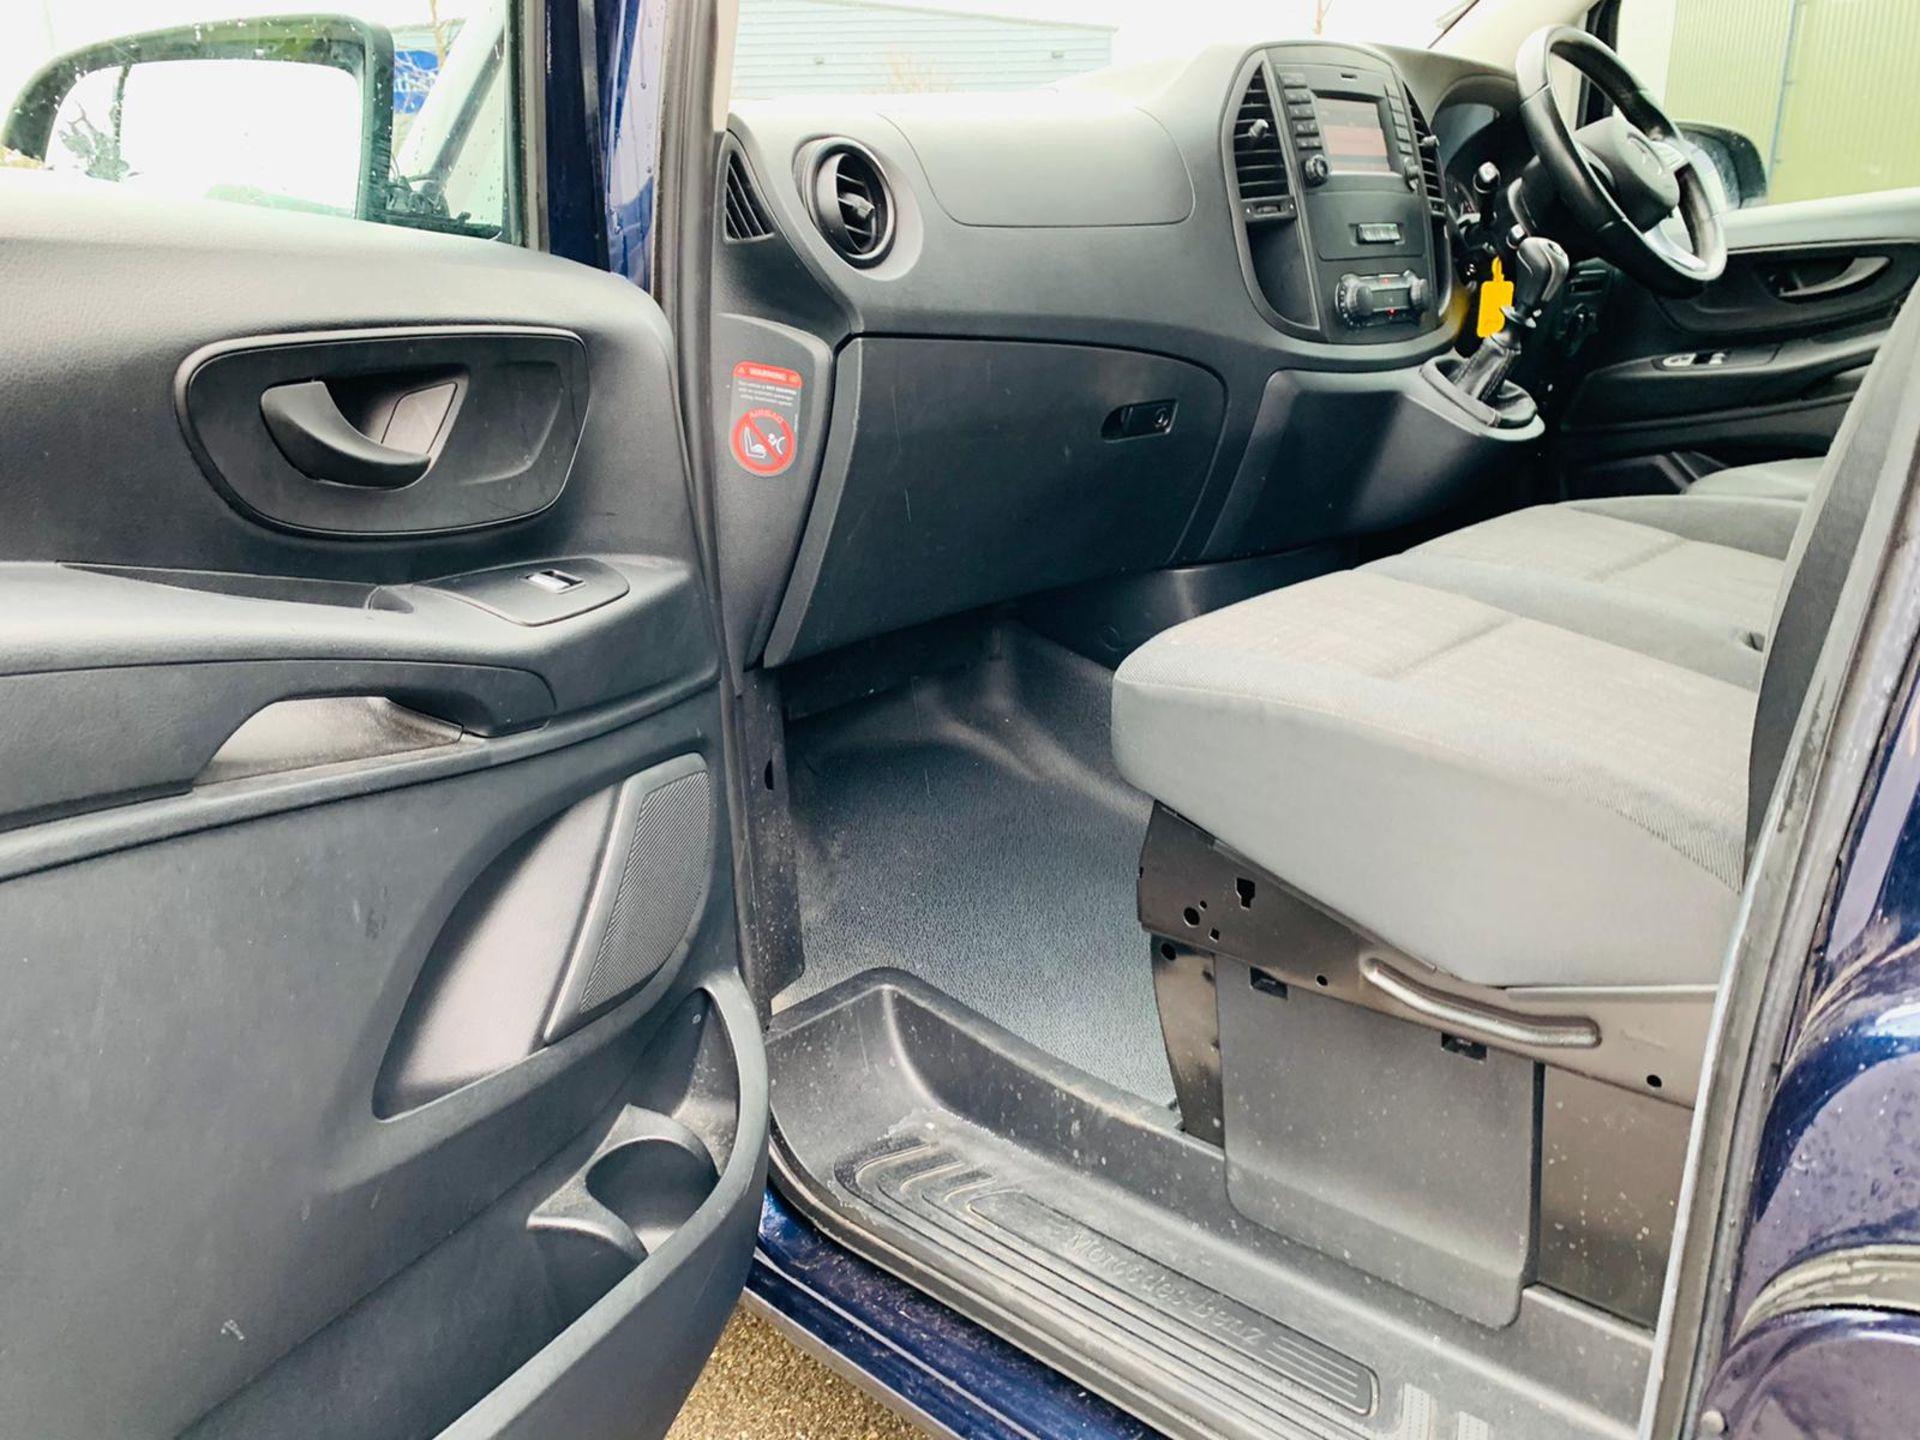 (RESERVE MET) Mercedes Vito 116Cdi Sporty Spec (161 BHP) Bluetech 6 Speed Van - 2016 Model - AC - Image 18 of 28